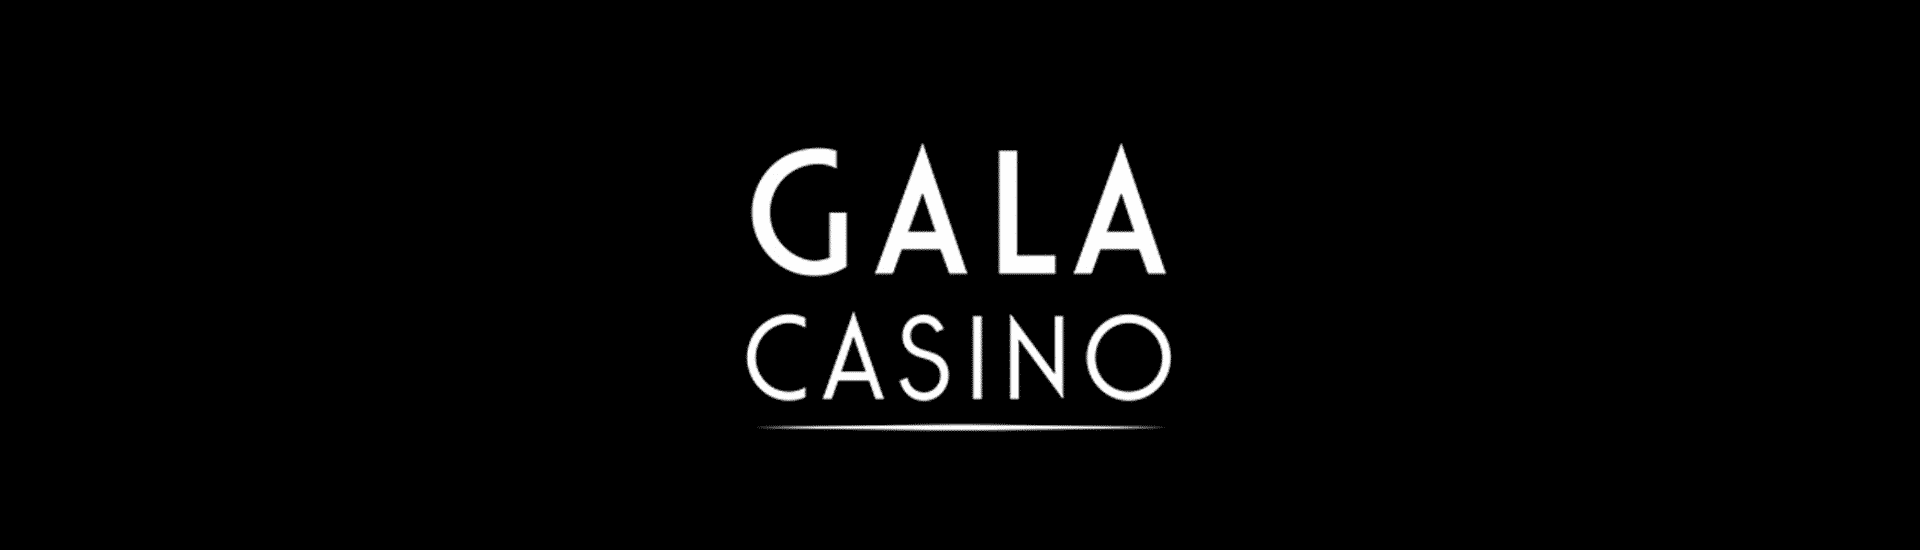 Gala Casino Featured Image